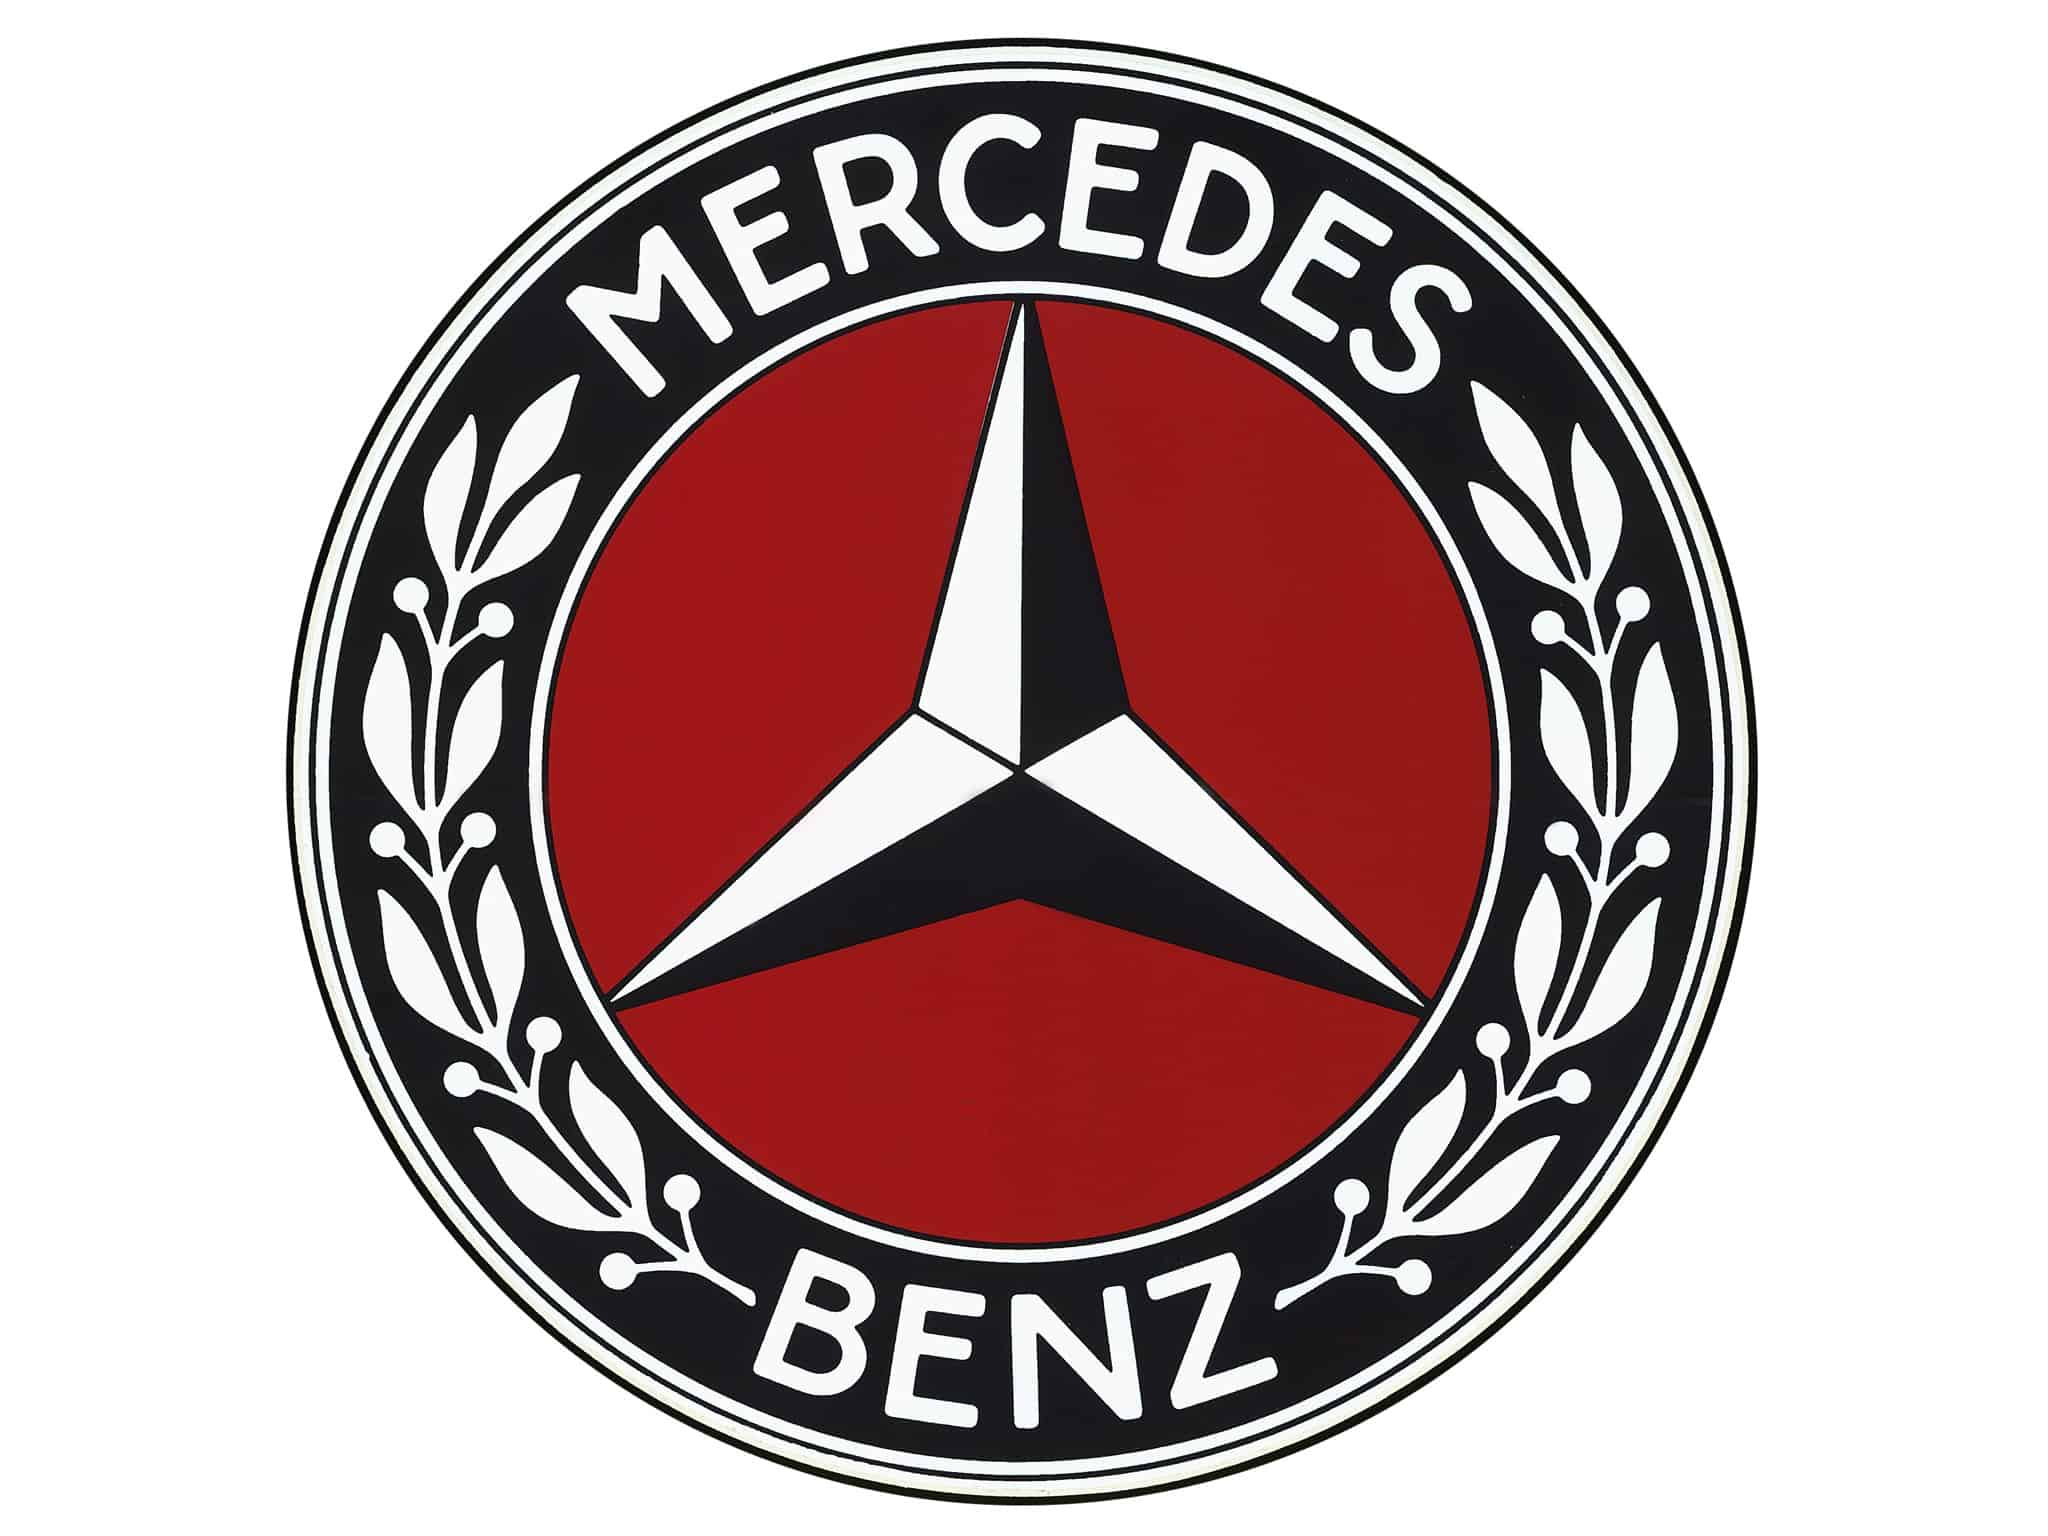 Mercedes benz v tesla game on electric suvs the musings of the mercedes benz v tesla game on electric suvs biocorpaavc